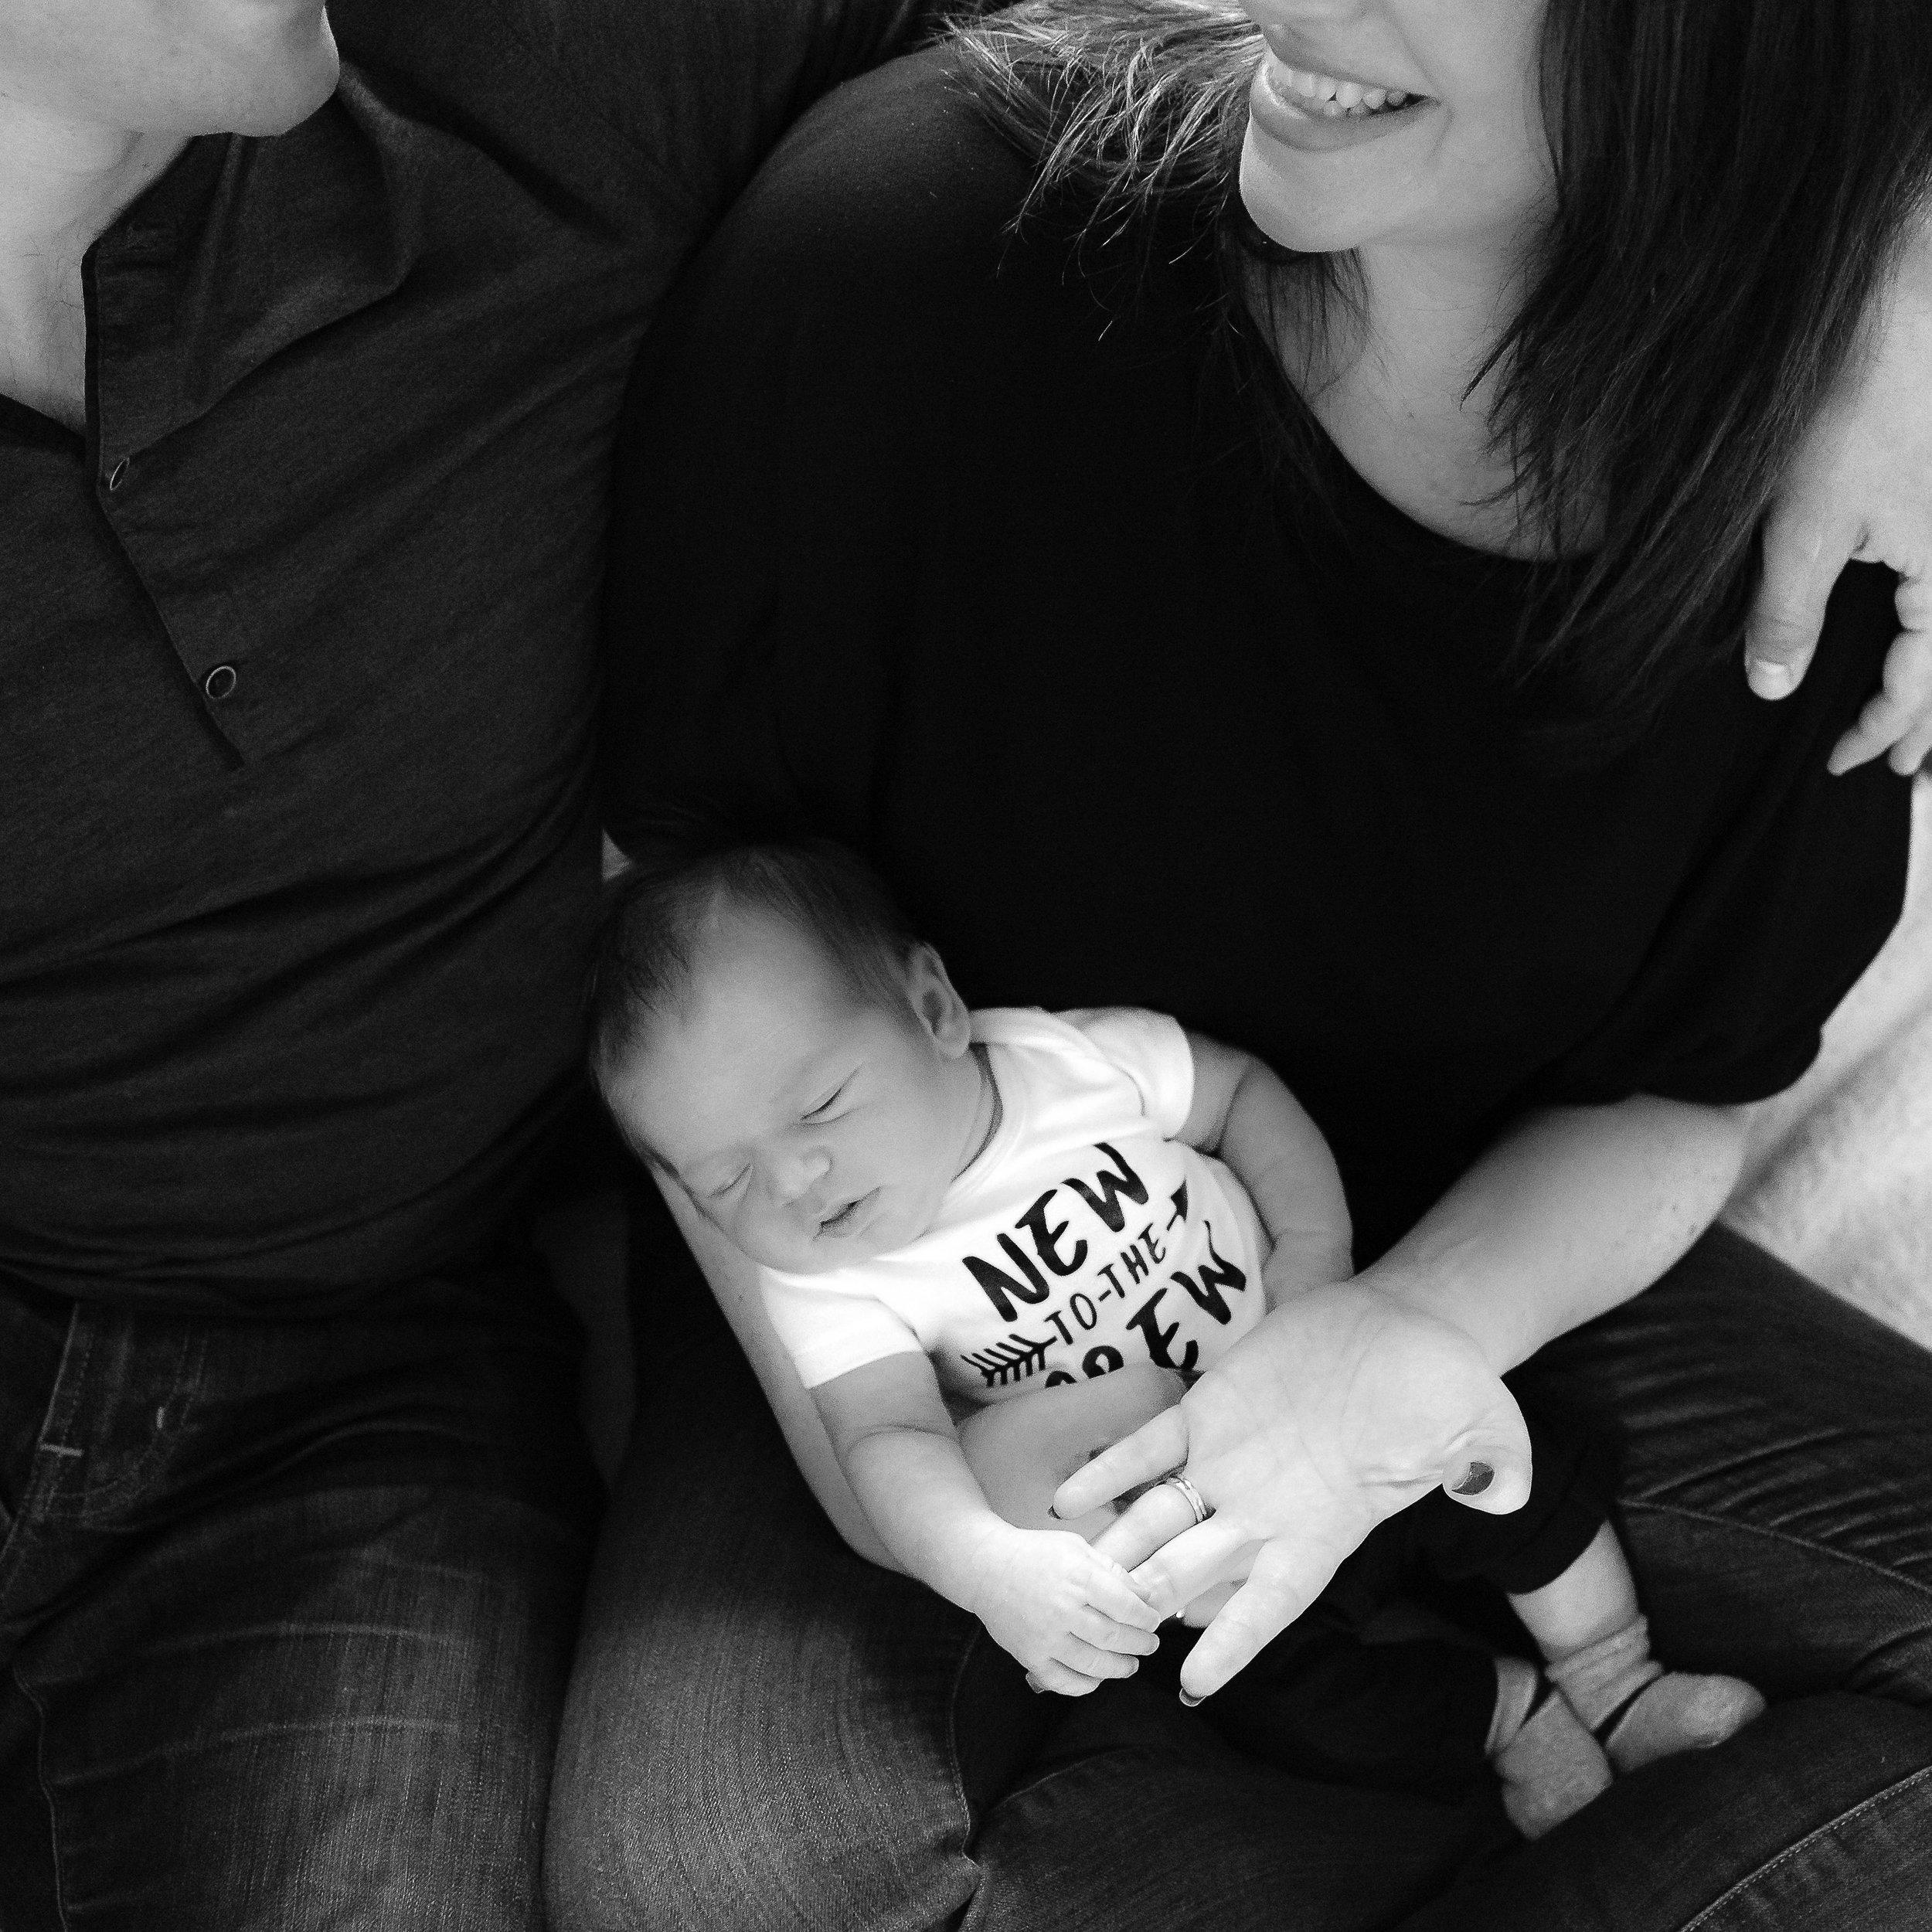 Erin-Fabio-Photography-Russell-Fischer_Newborns-121.jpg